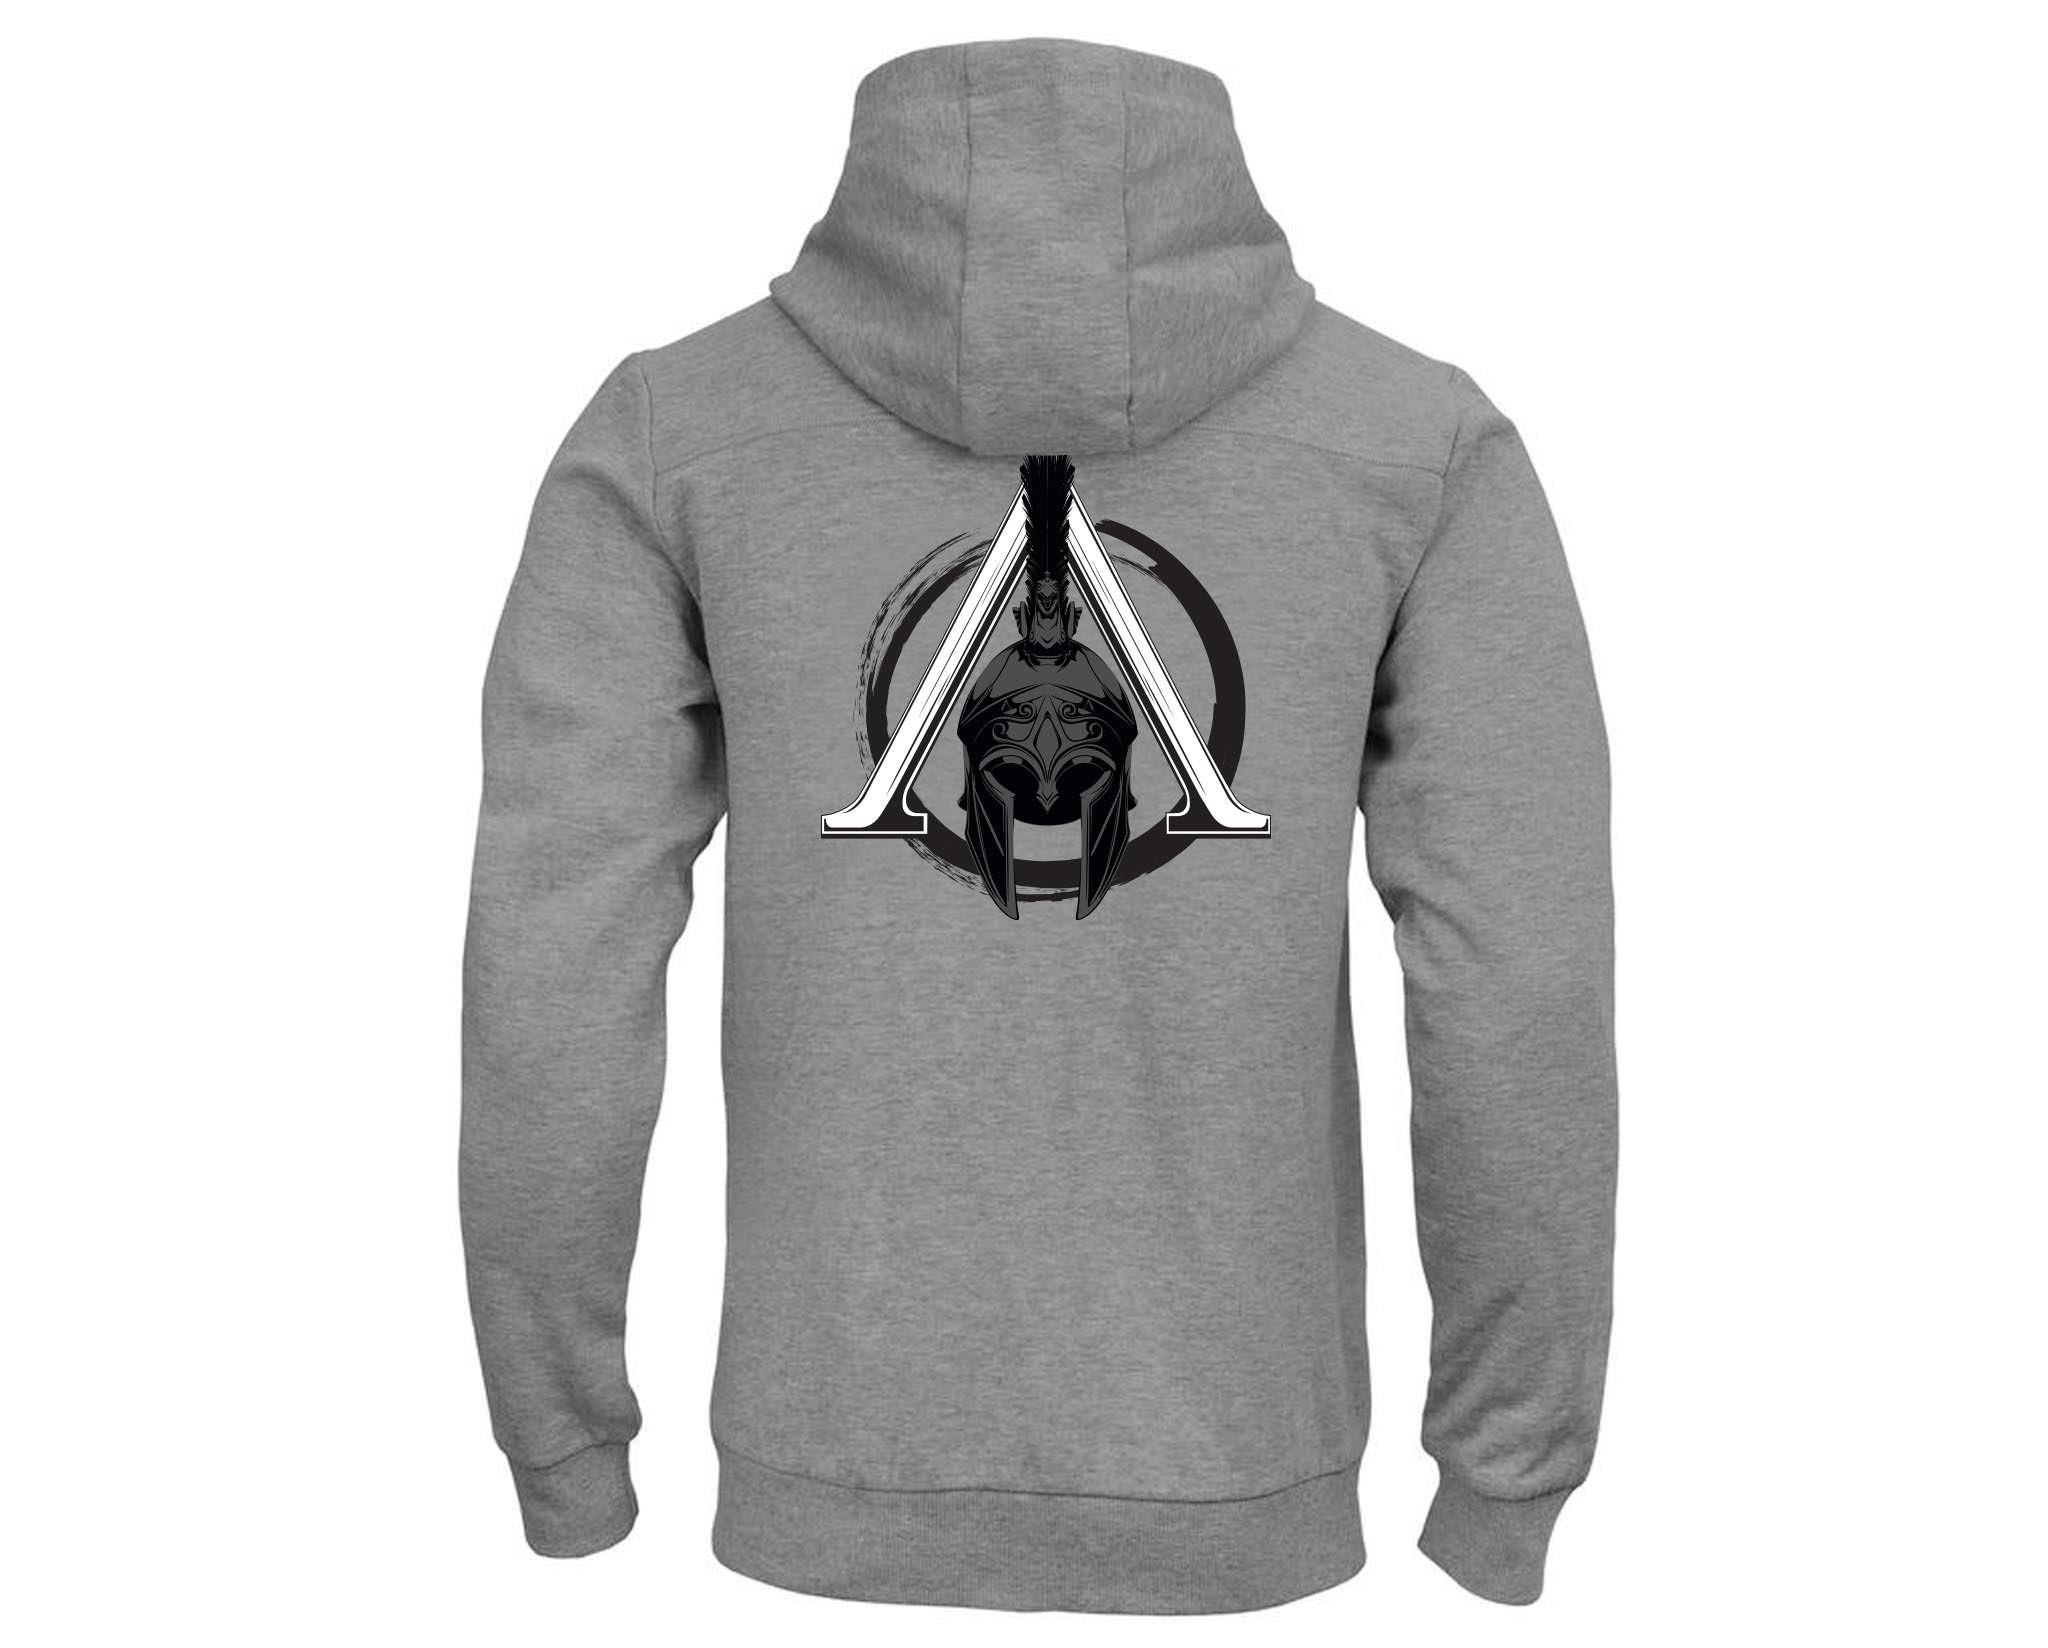 Spartan Hoodie Creed Assassin's Ubisoft Odyssey Qgyp5 Store kXZuiPO